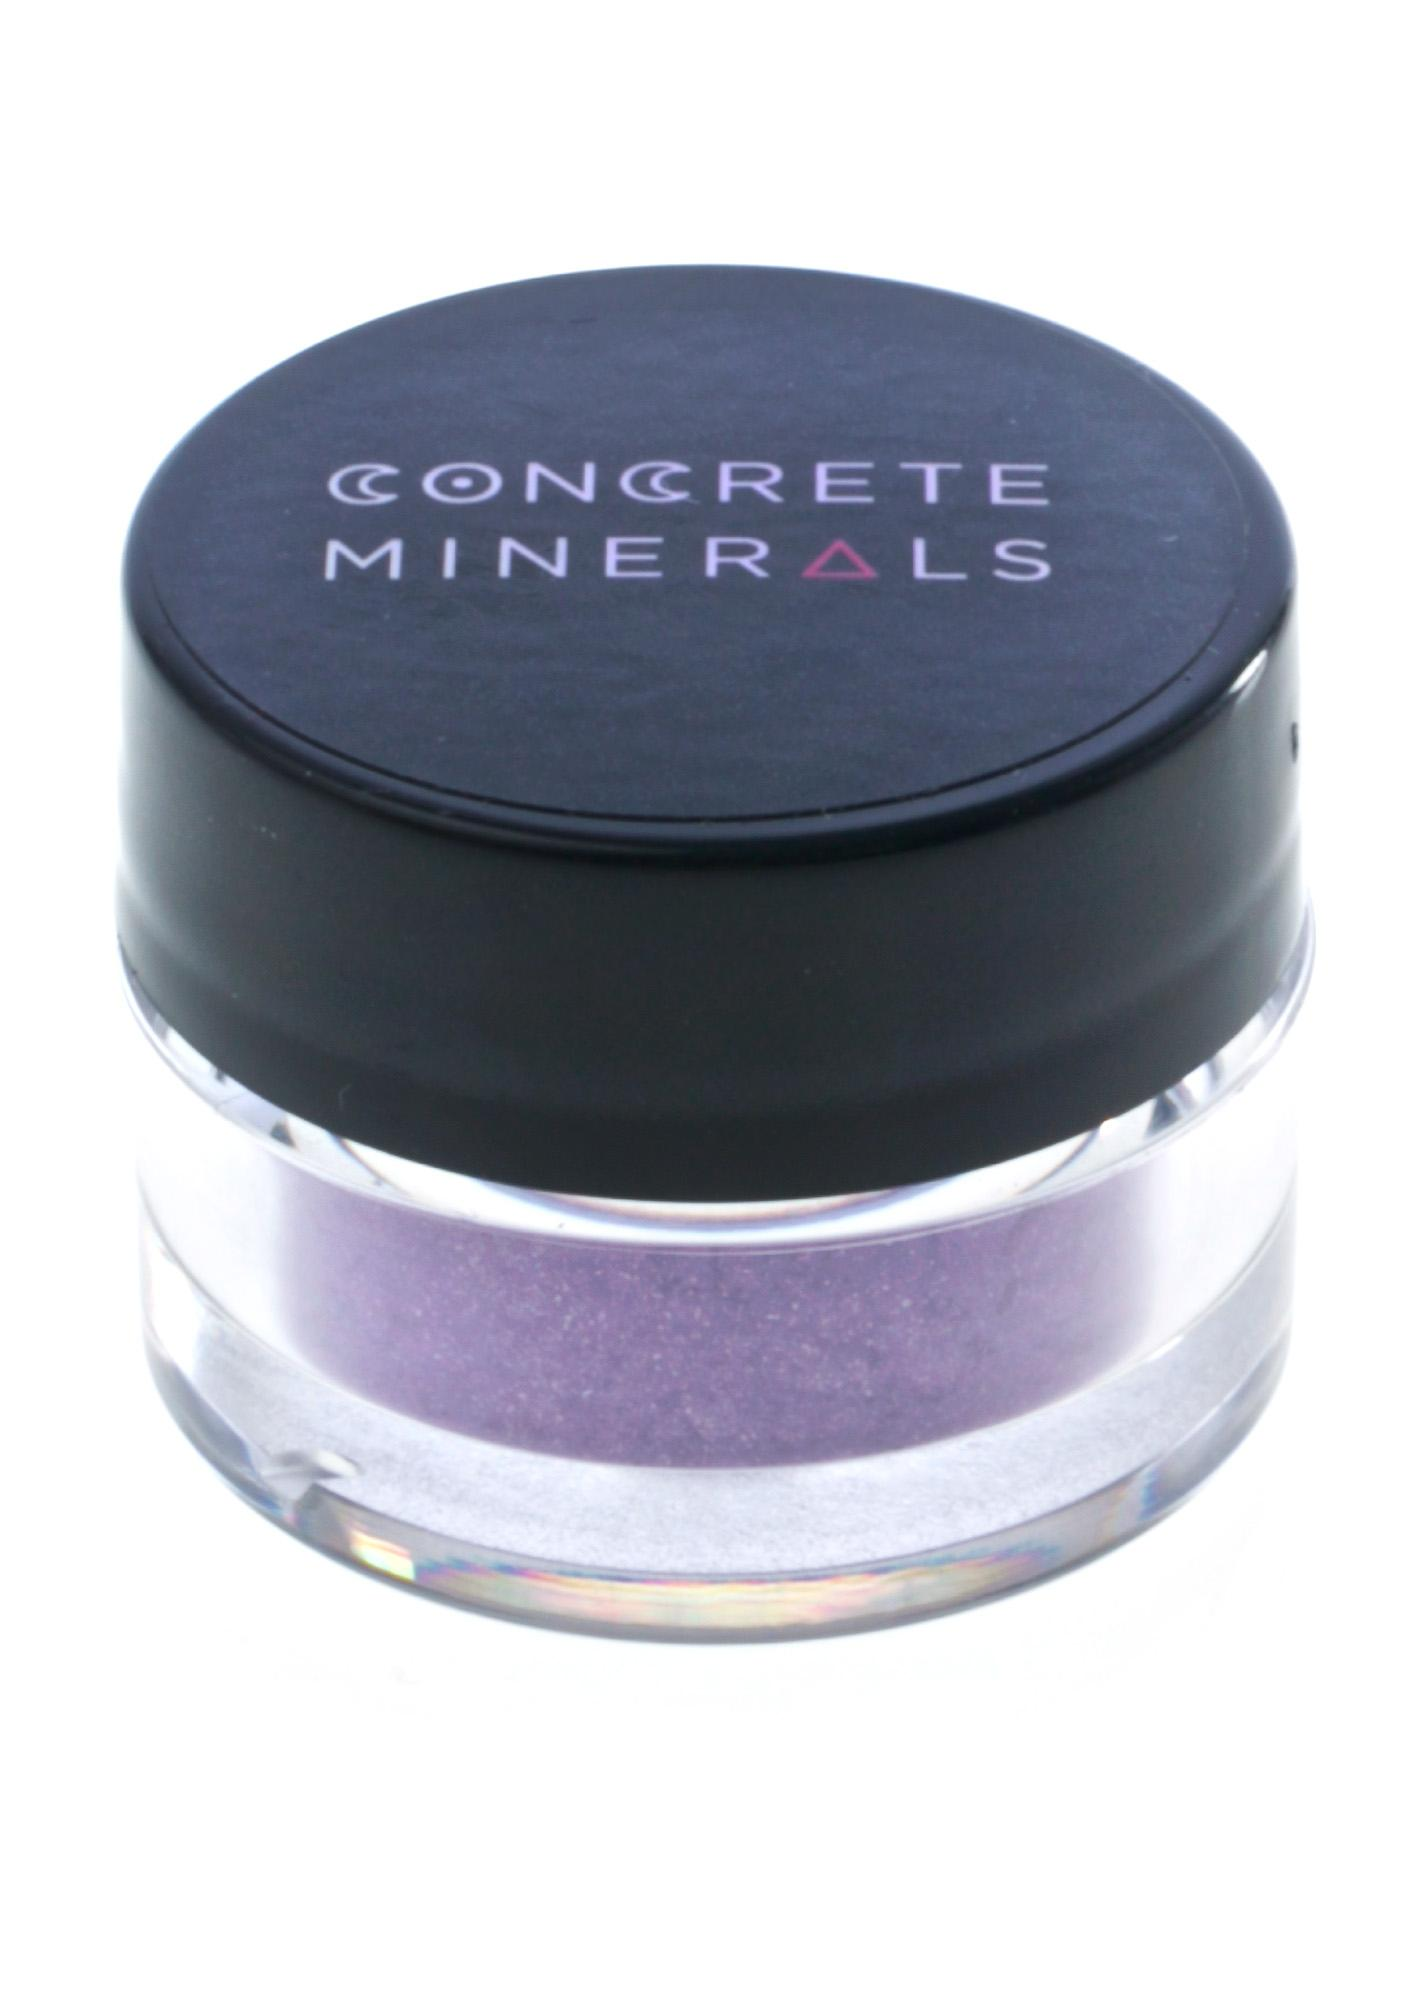 concrete minerals unity mineral eyeshadow dolls kill. Black Bedroom Furniture Sets. Home Design Ideas